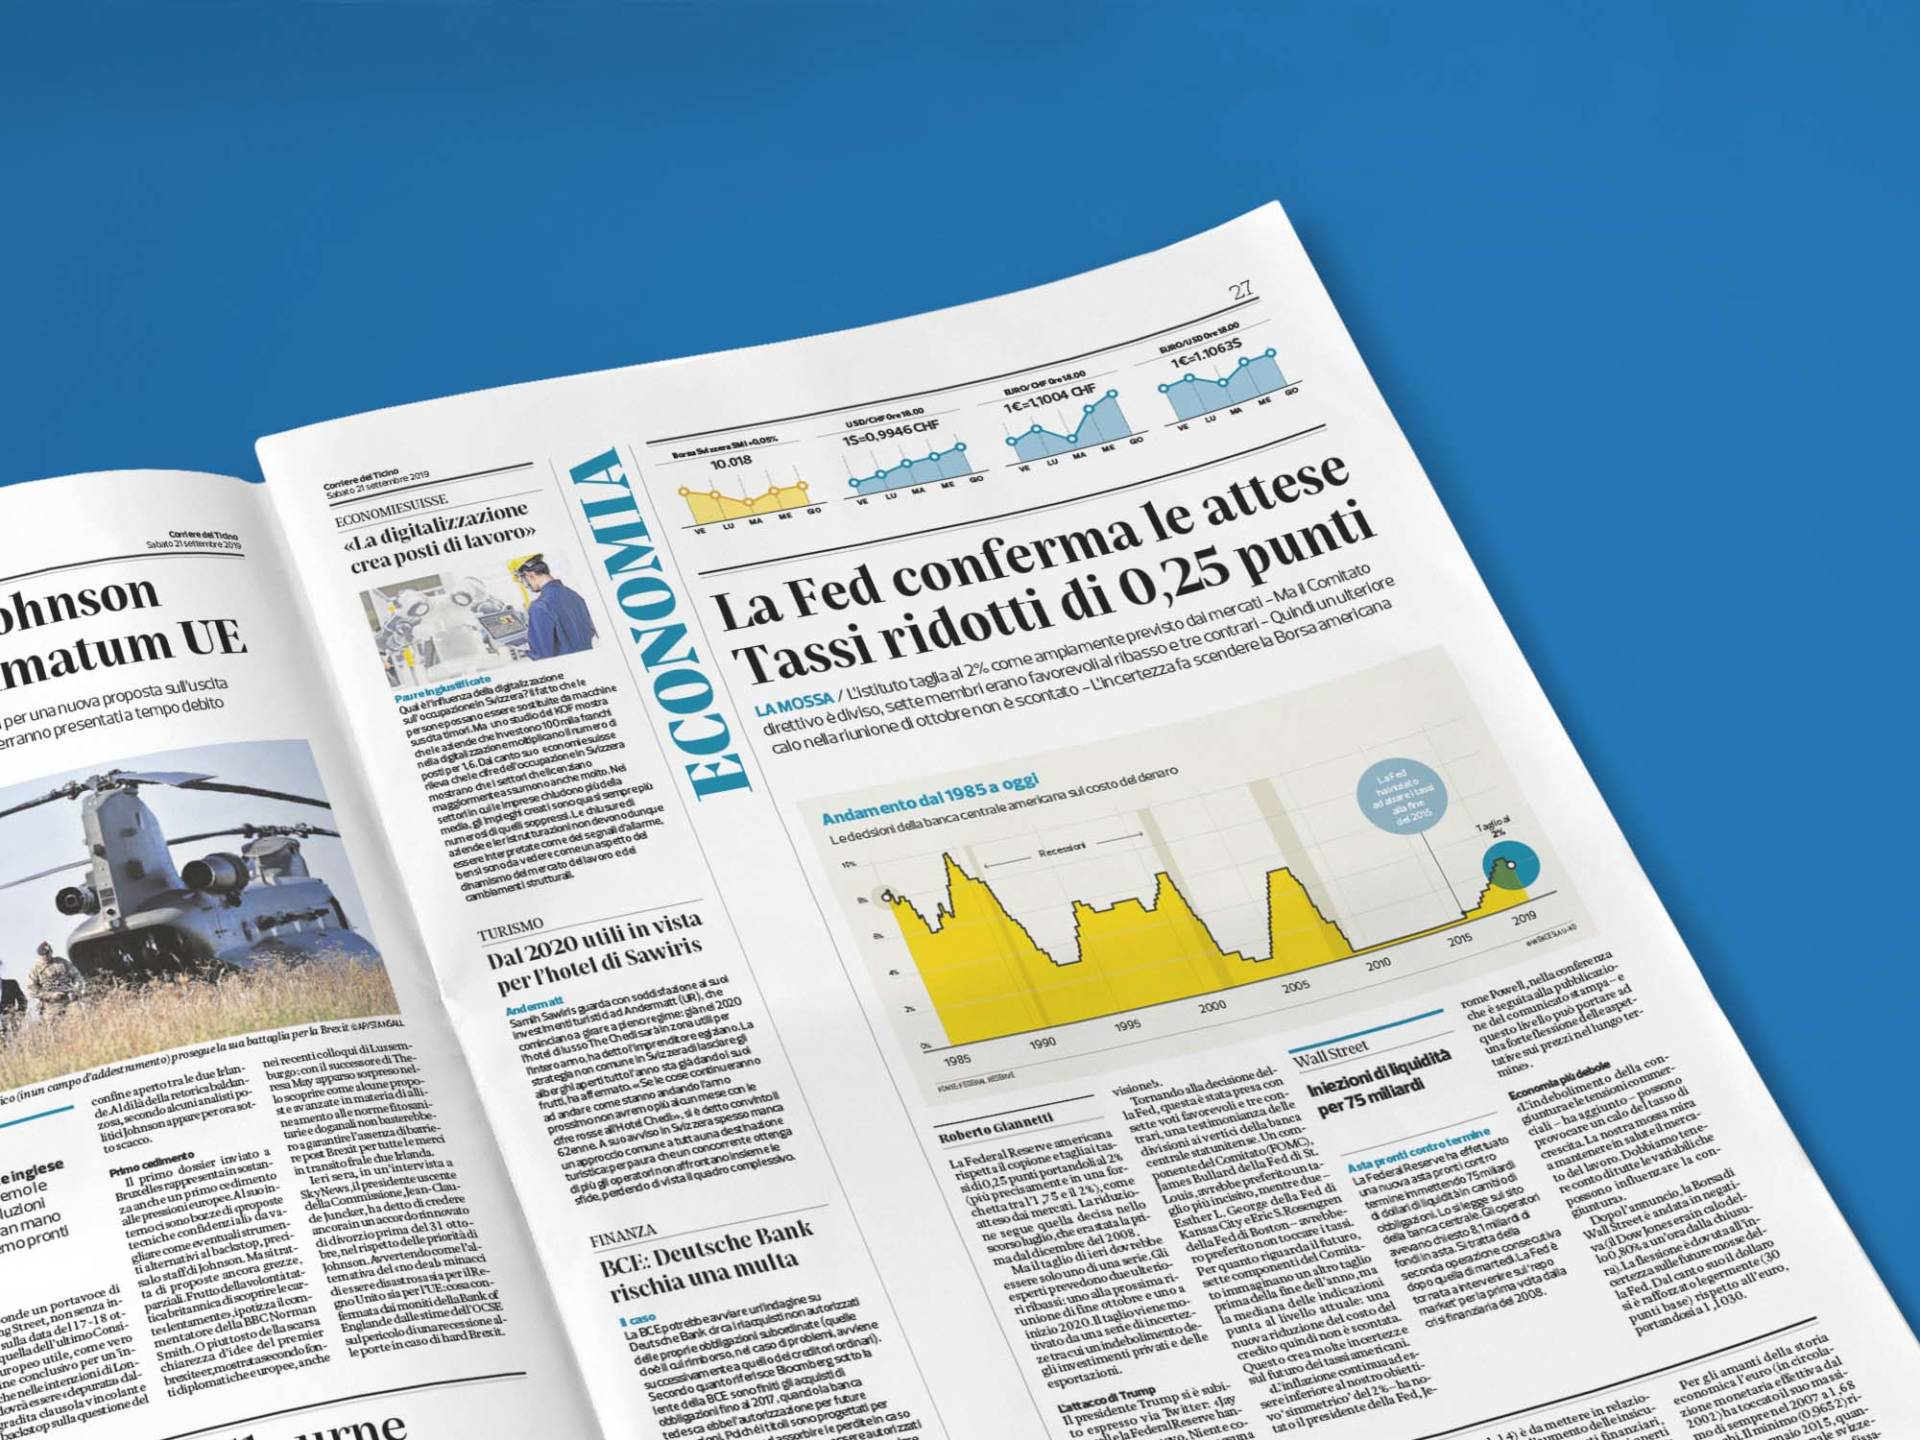 Corriere_del_Ticino_Info_01_Wenceslau_News_Design